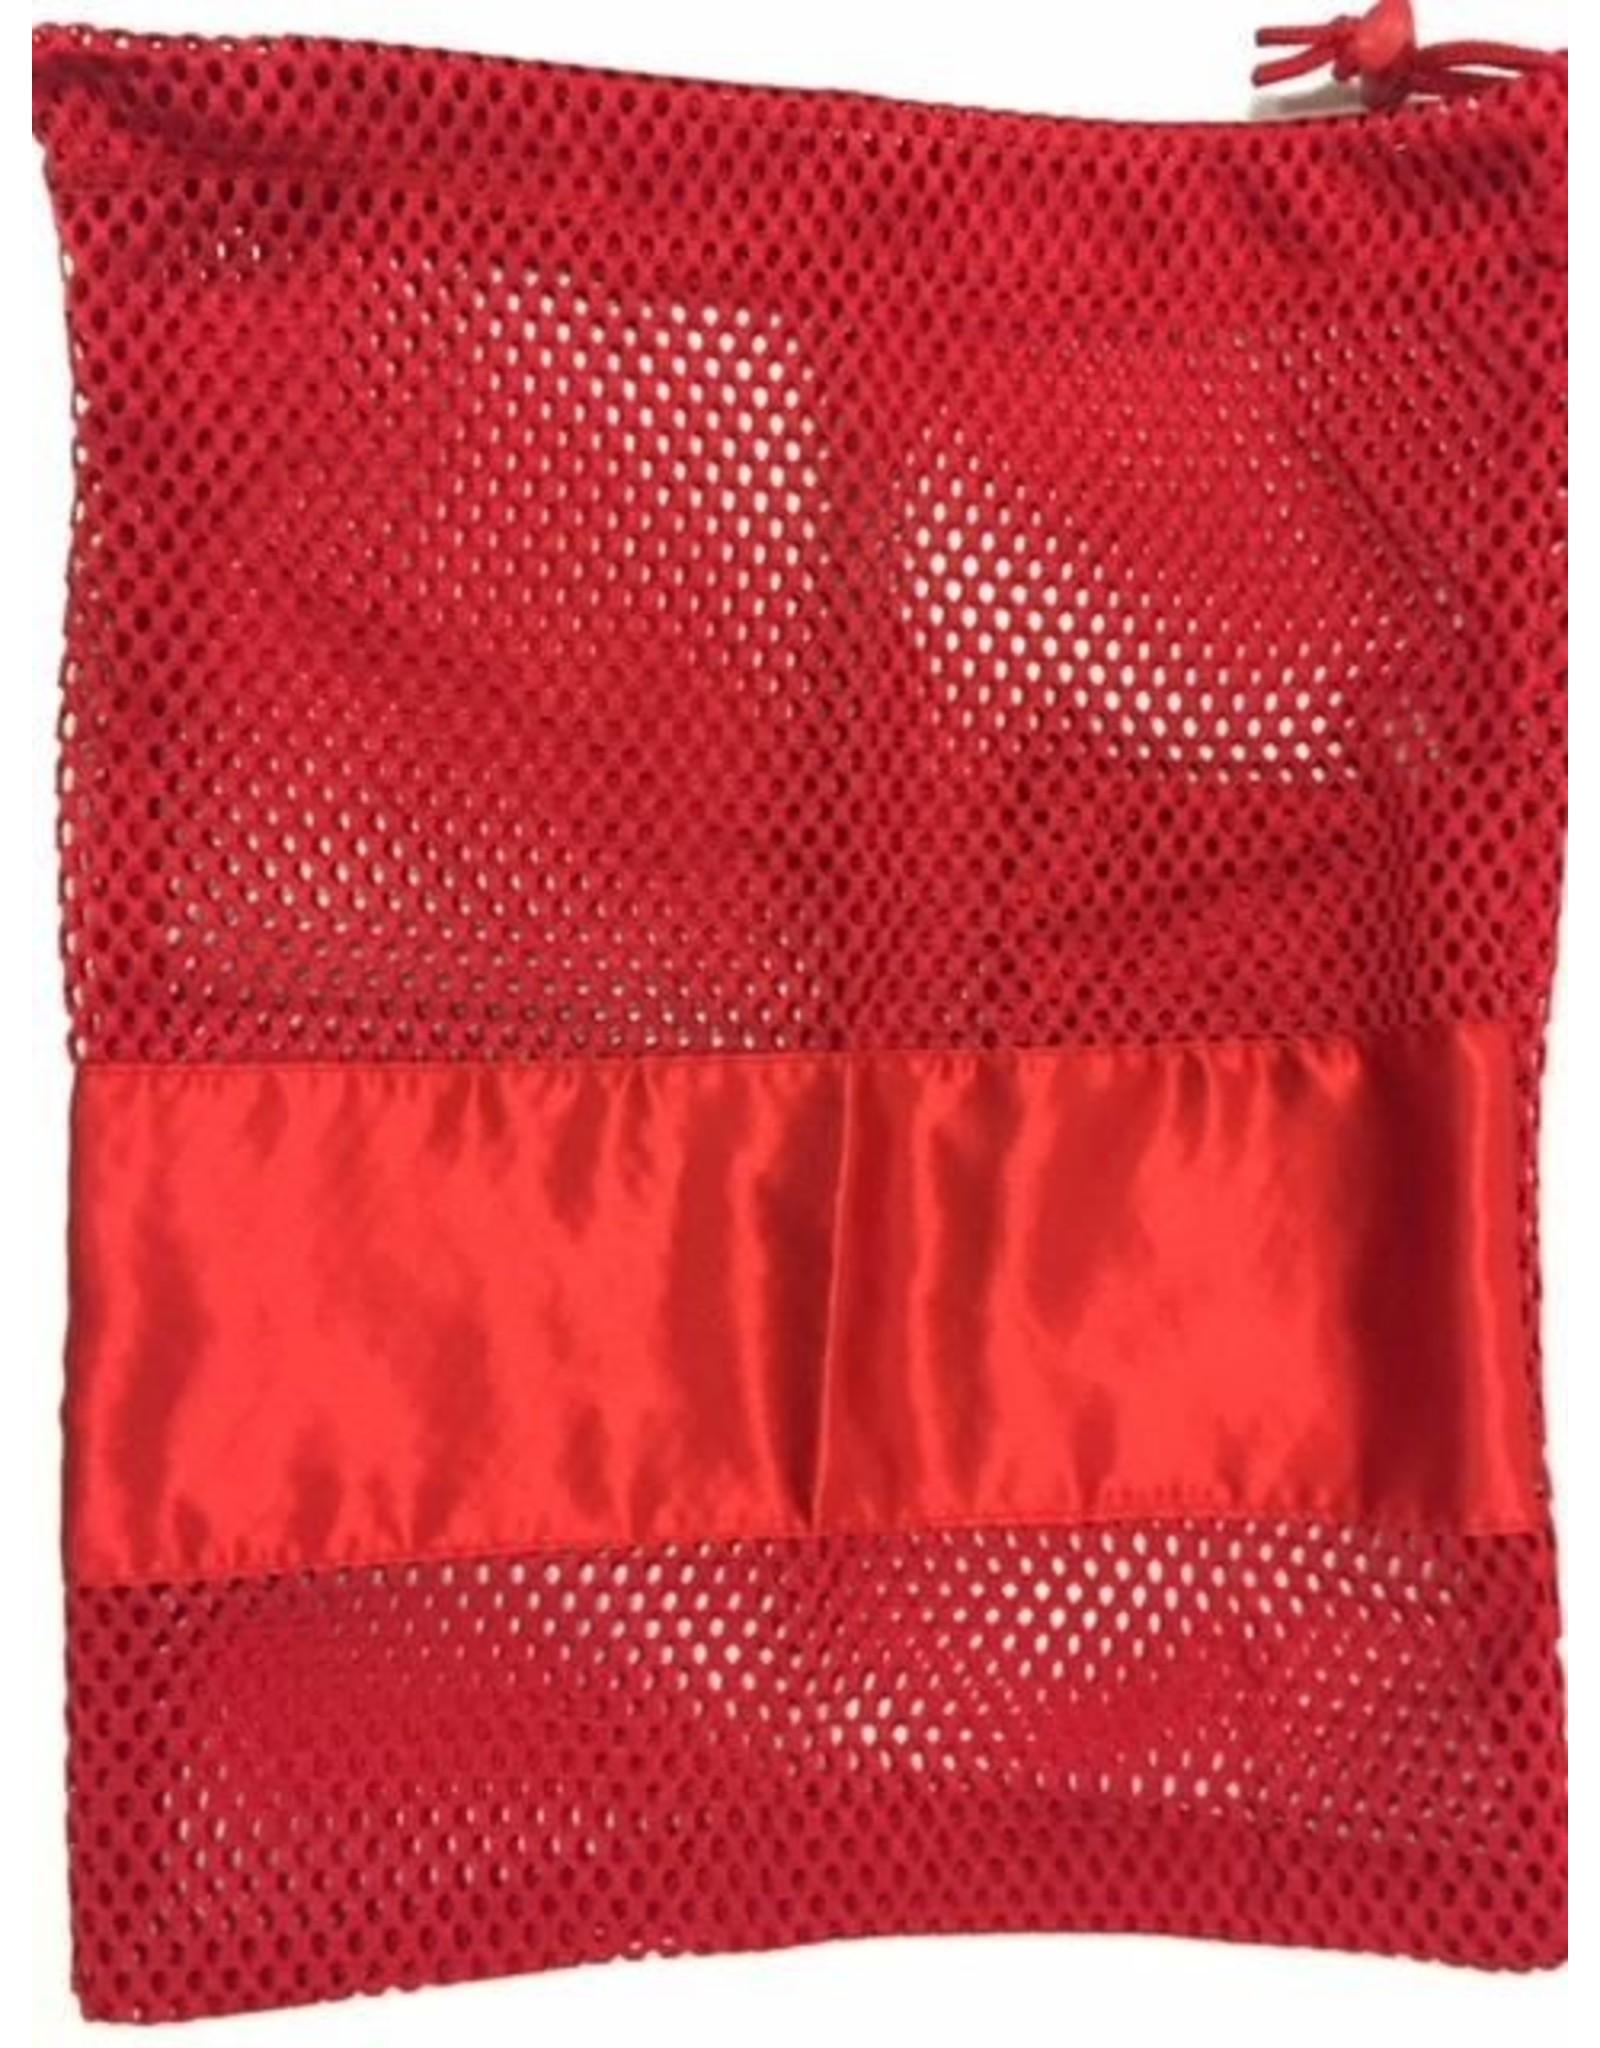 Pillows Pillows- PSP- Mesh Bag-